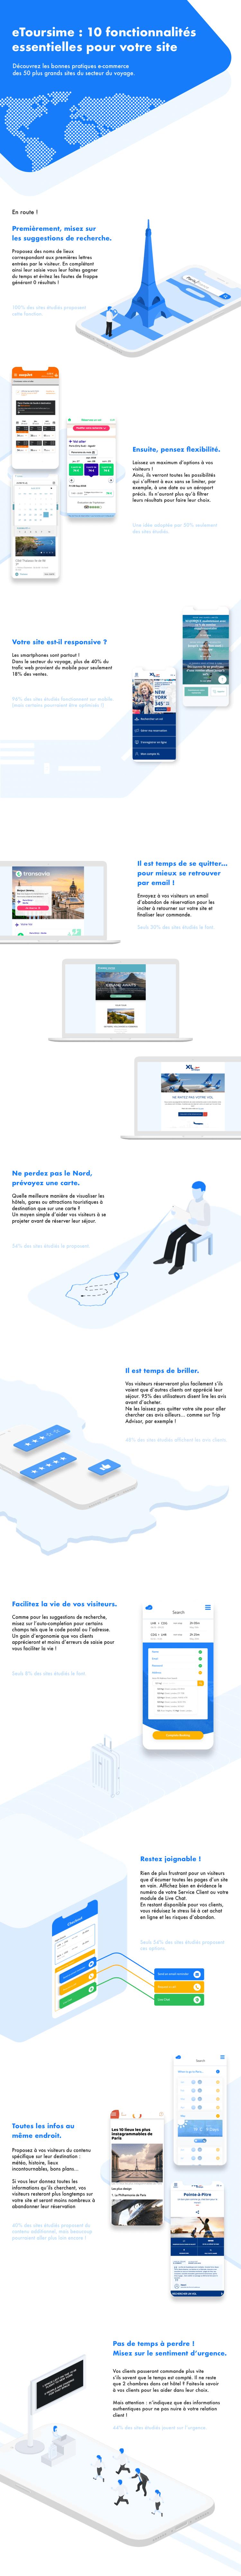 infographie etourisme